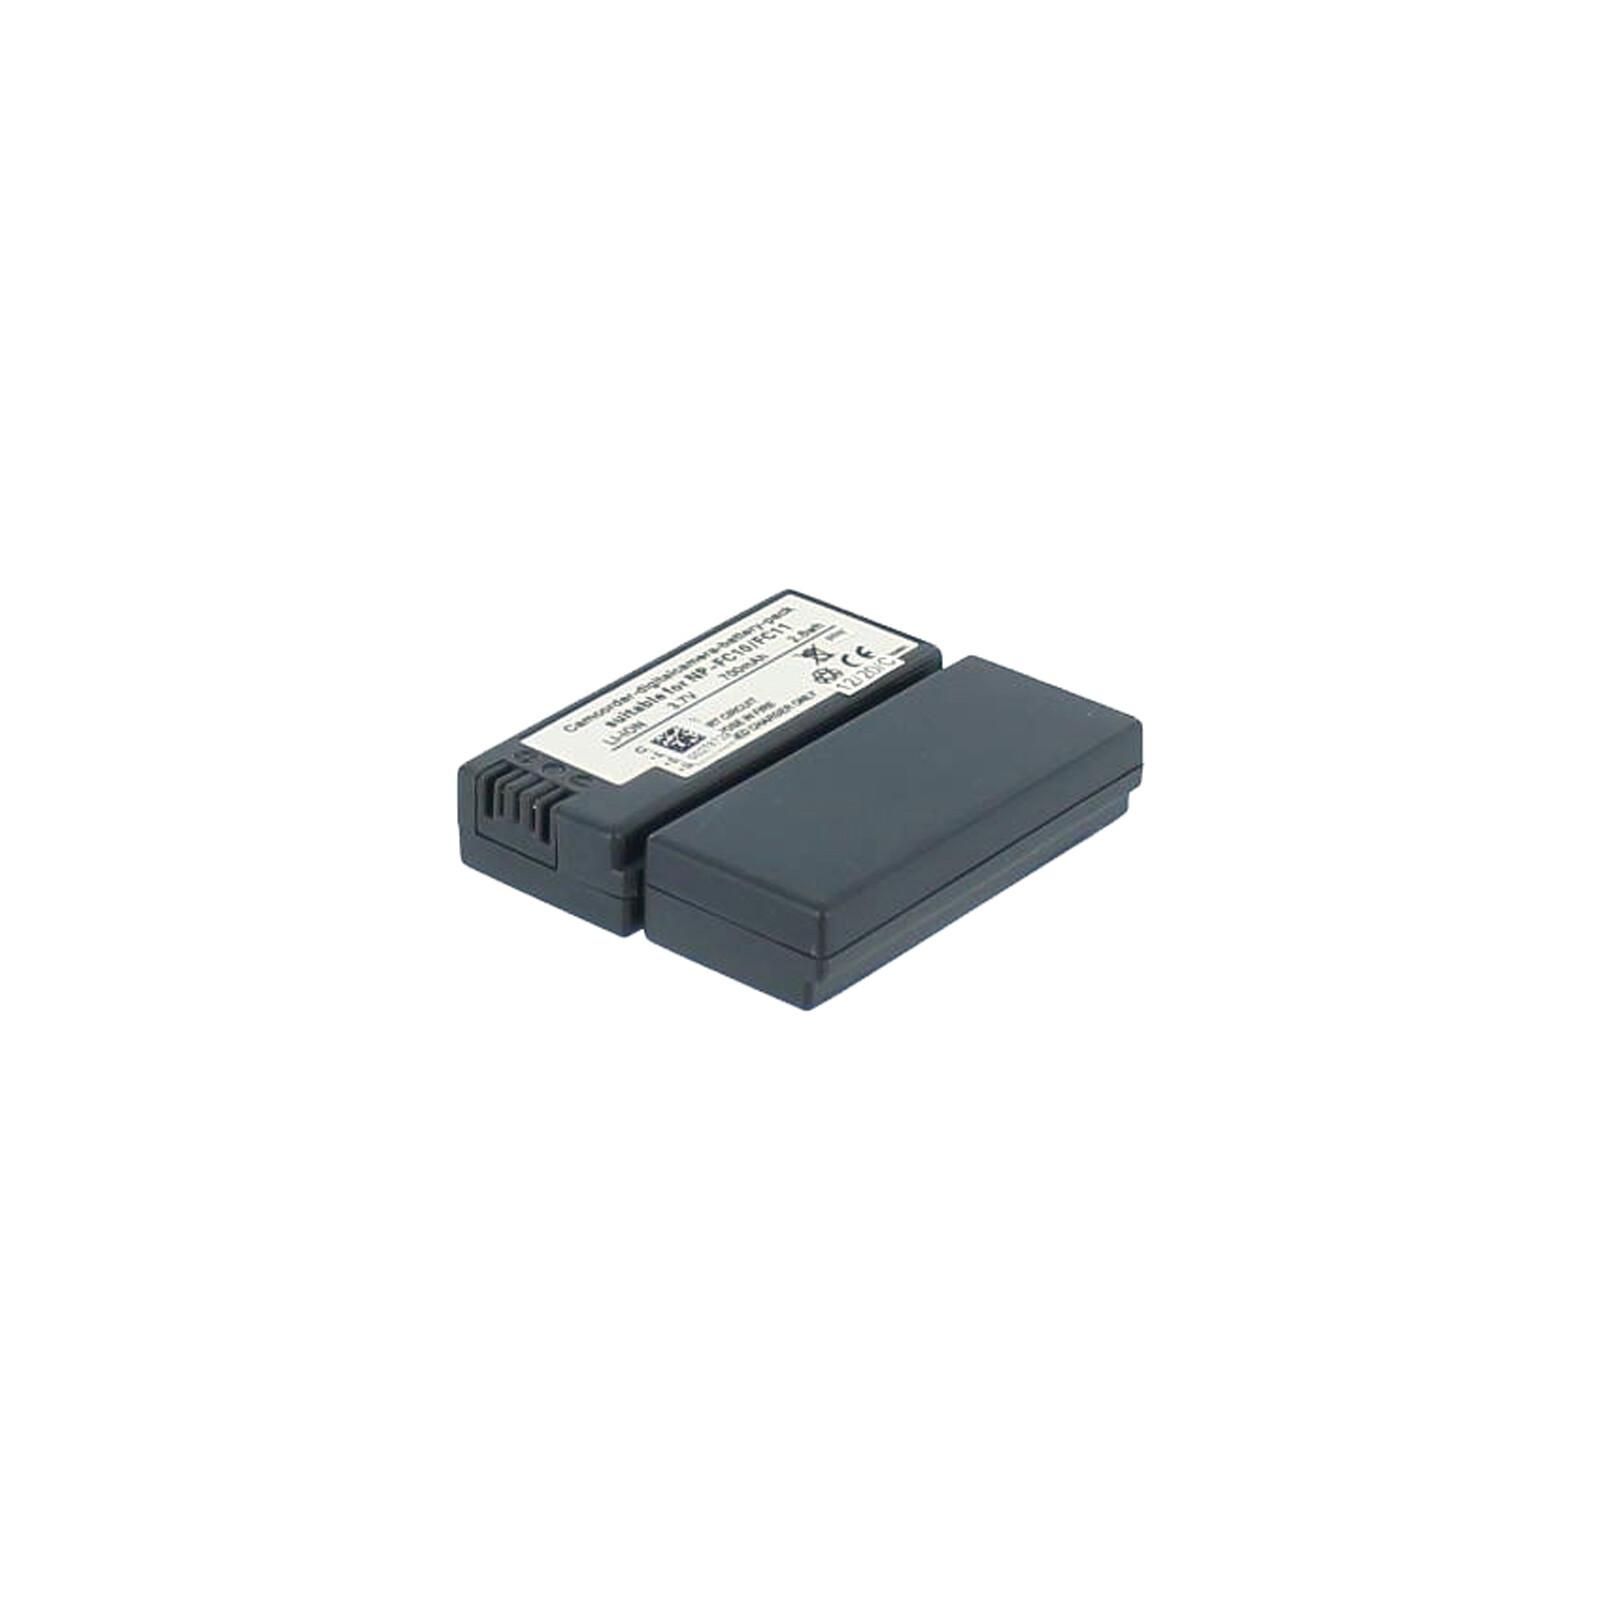 AGI 22880 Akku Sony DSC-V1